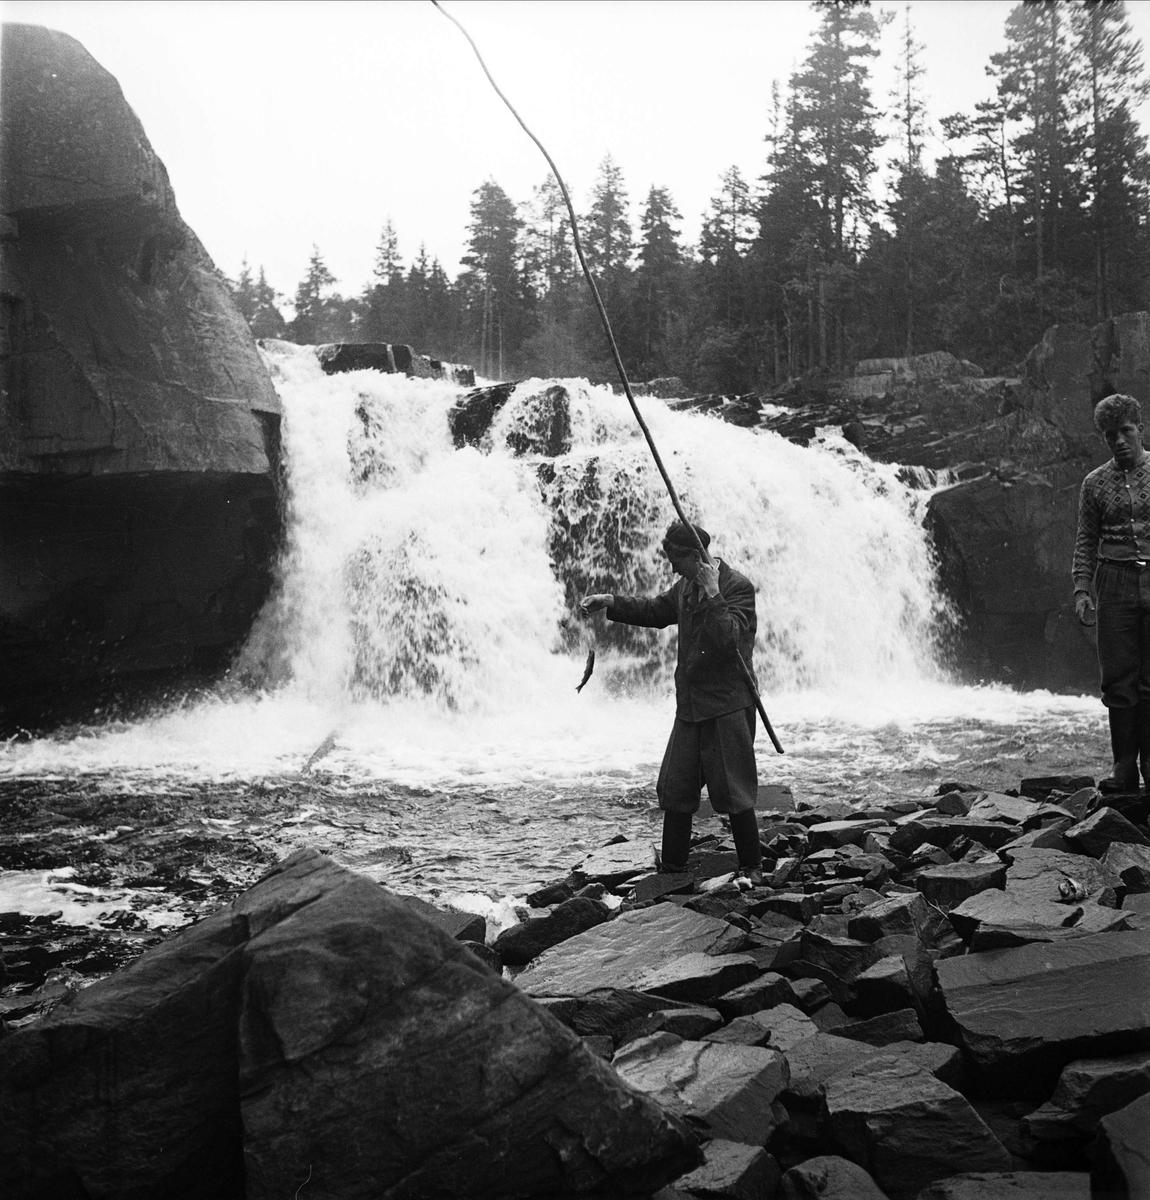 Fiske vid fors, Norge 1947